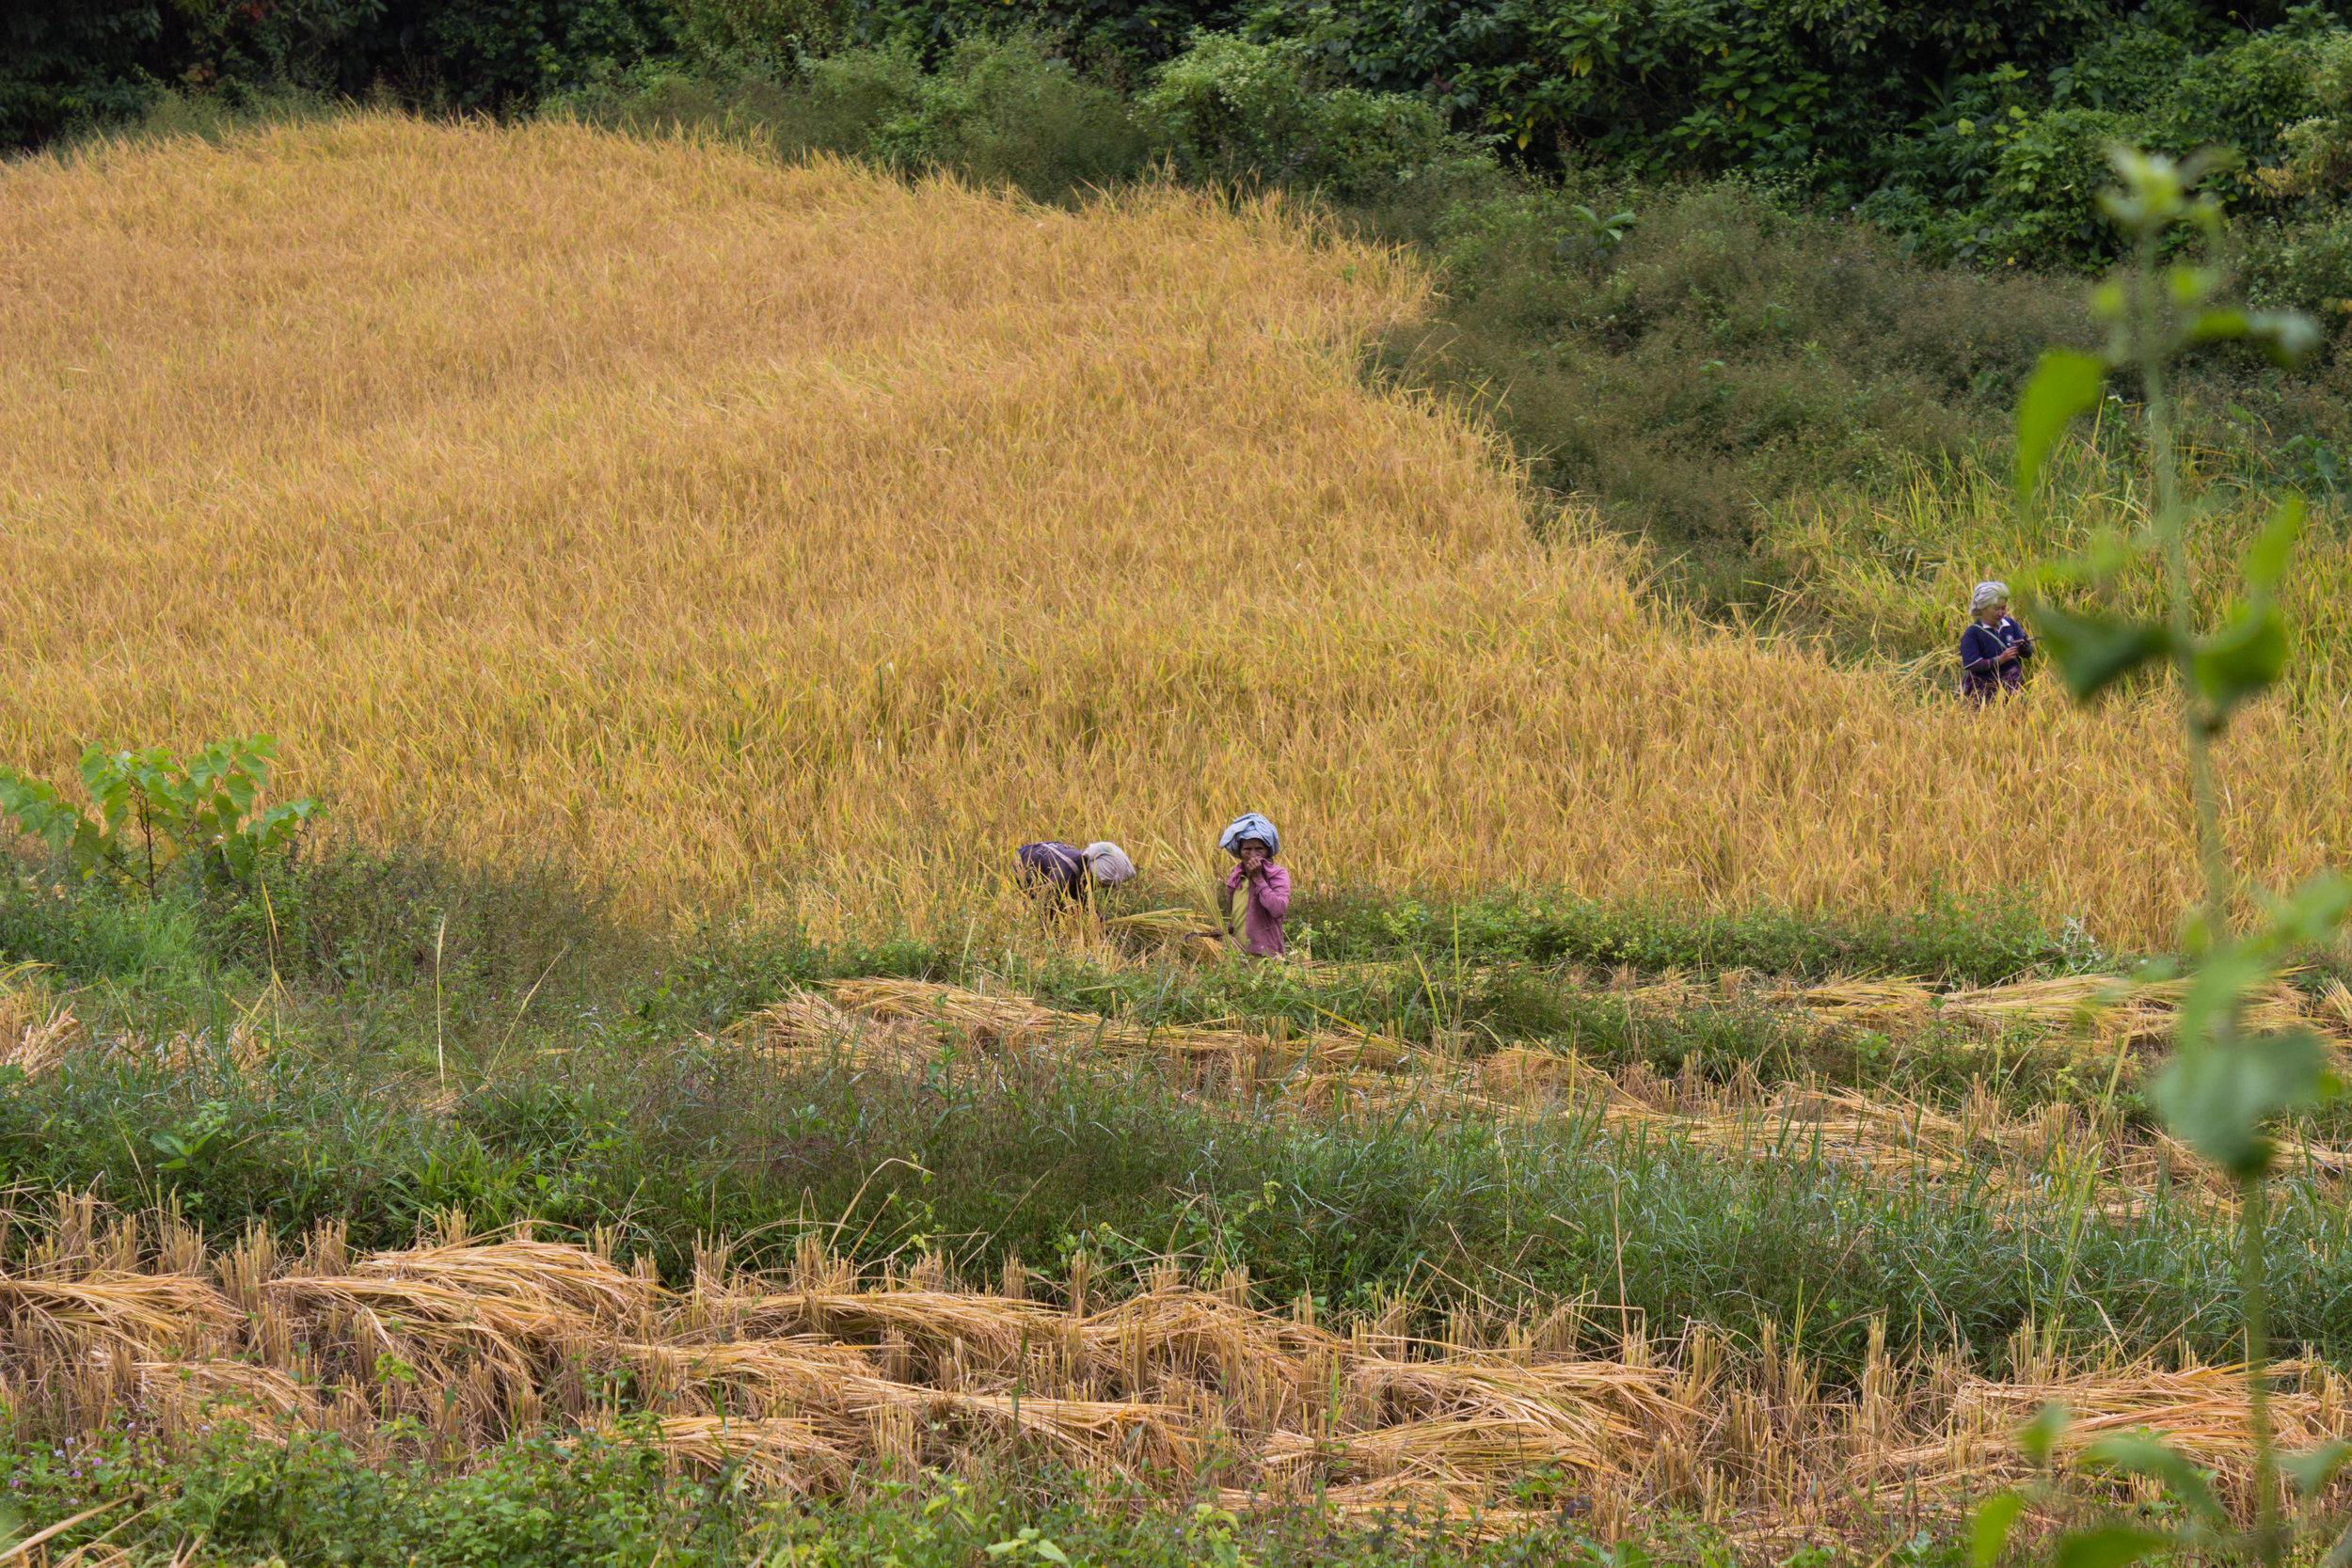 Local Karen villagers harvest rice